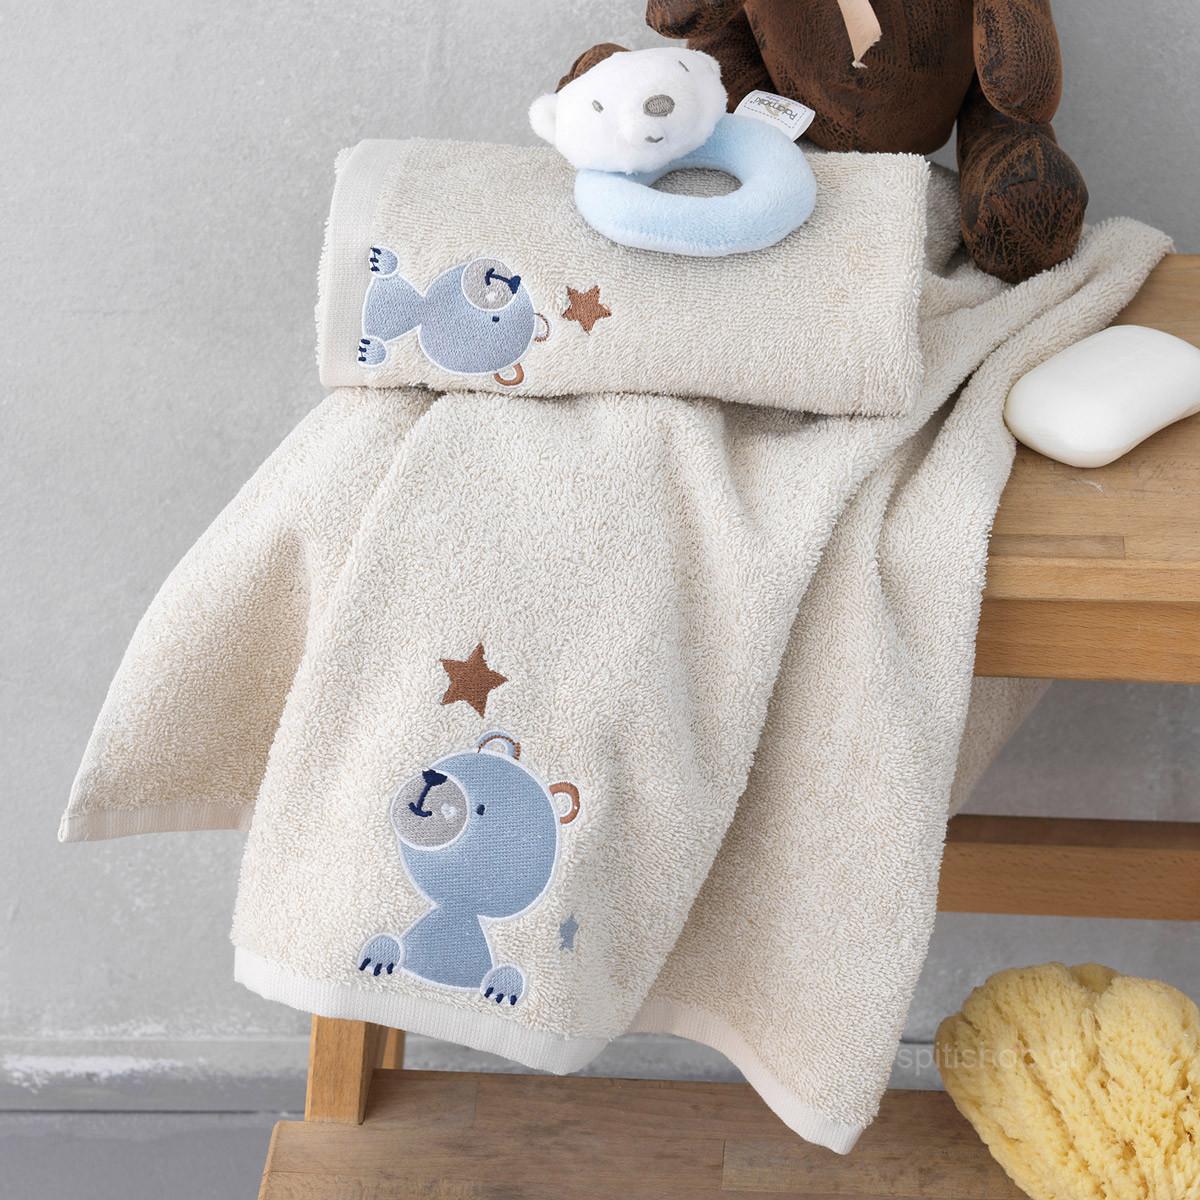 cc3edd3215c -10% Spiti Shop Βρεφικές Πετσέτες (Σετ 2τμχ) Palamaiki Bear